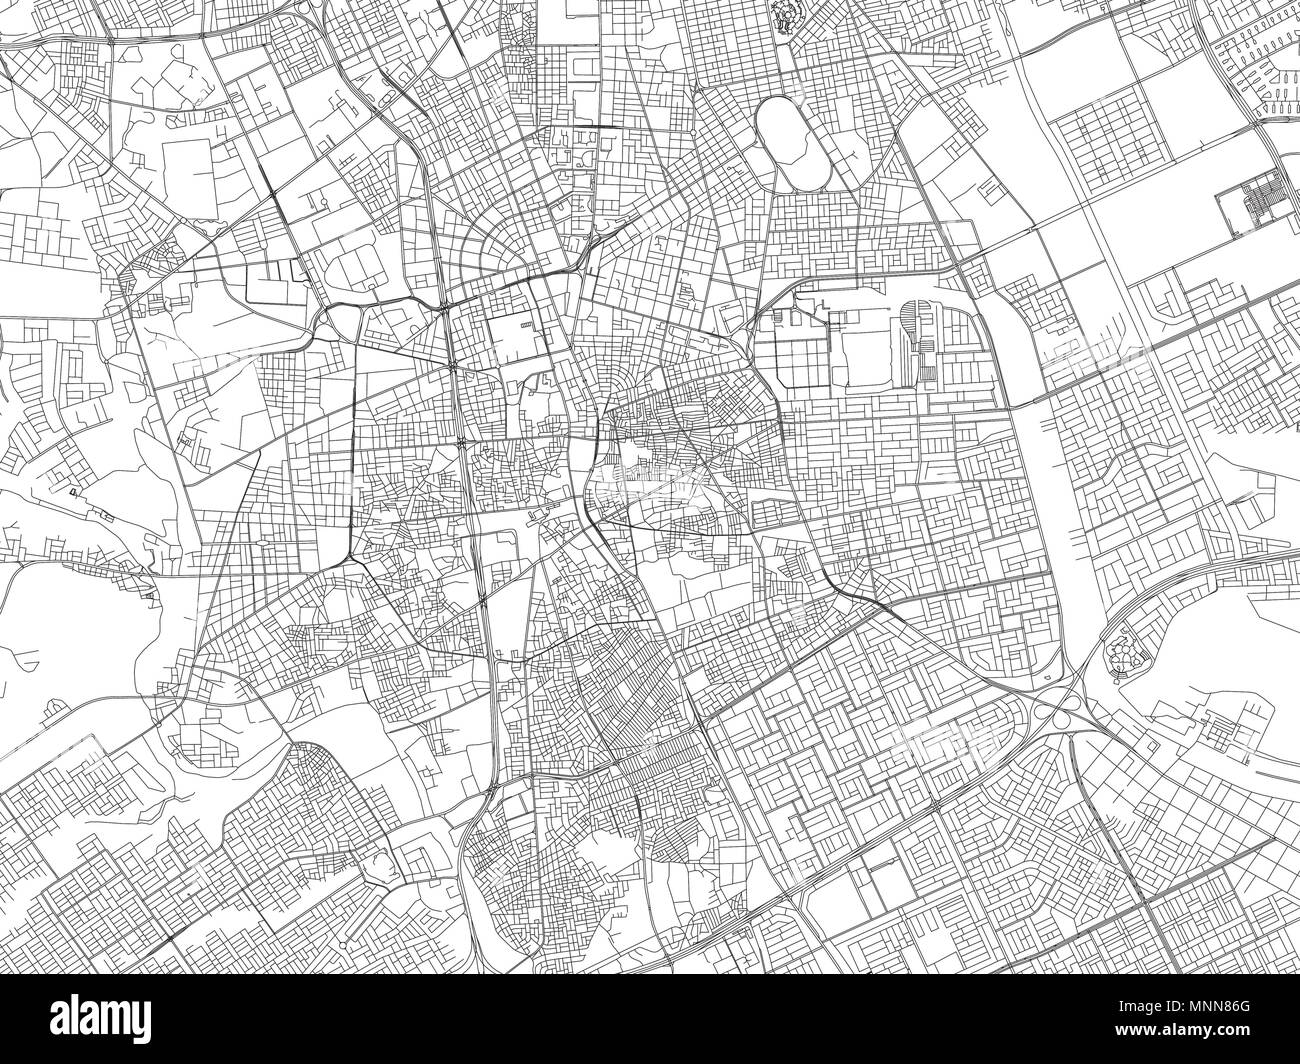 Streets of Riyadh, city map, Saudi Arabia, satellite view ... on middle east map, riyadh on a map, world landforms map, jerusalem map, riyadh street map, damascus map,